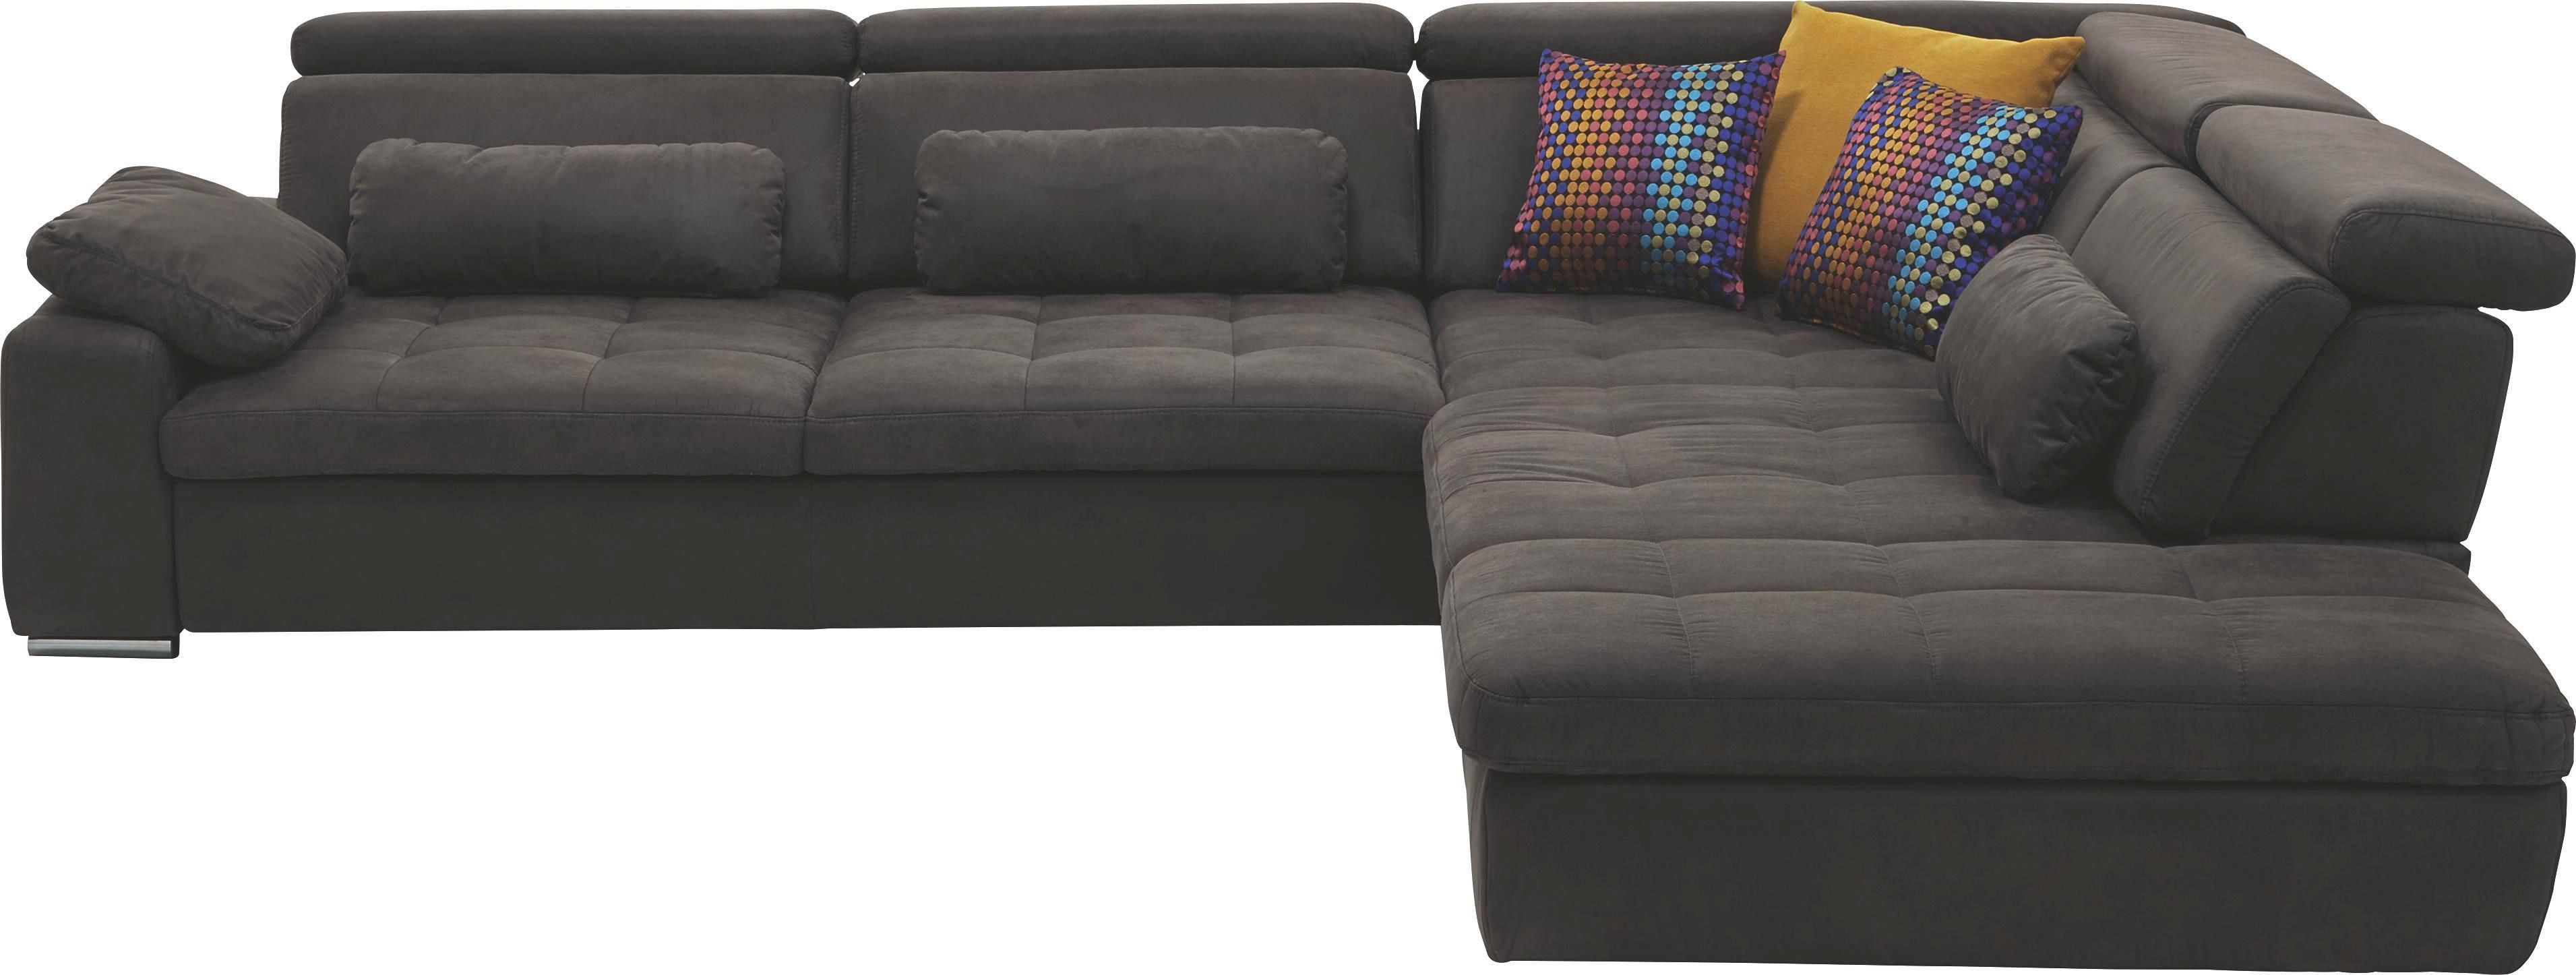 Ecksofa Mikrofaser Rücken Echt   Chromfarben/Braun, Design,  Kunststoff/Textil (299